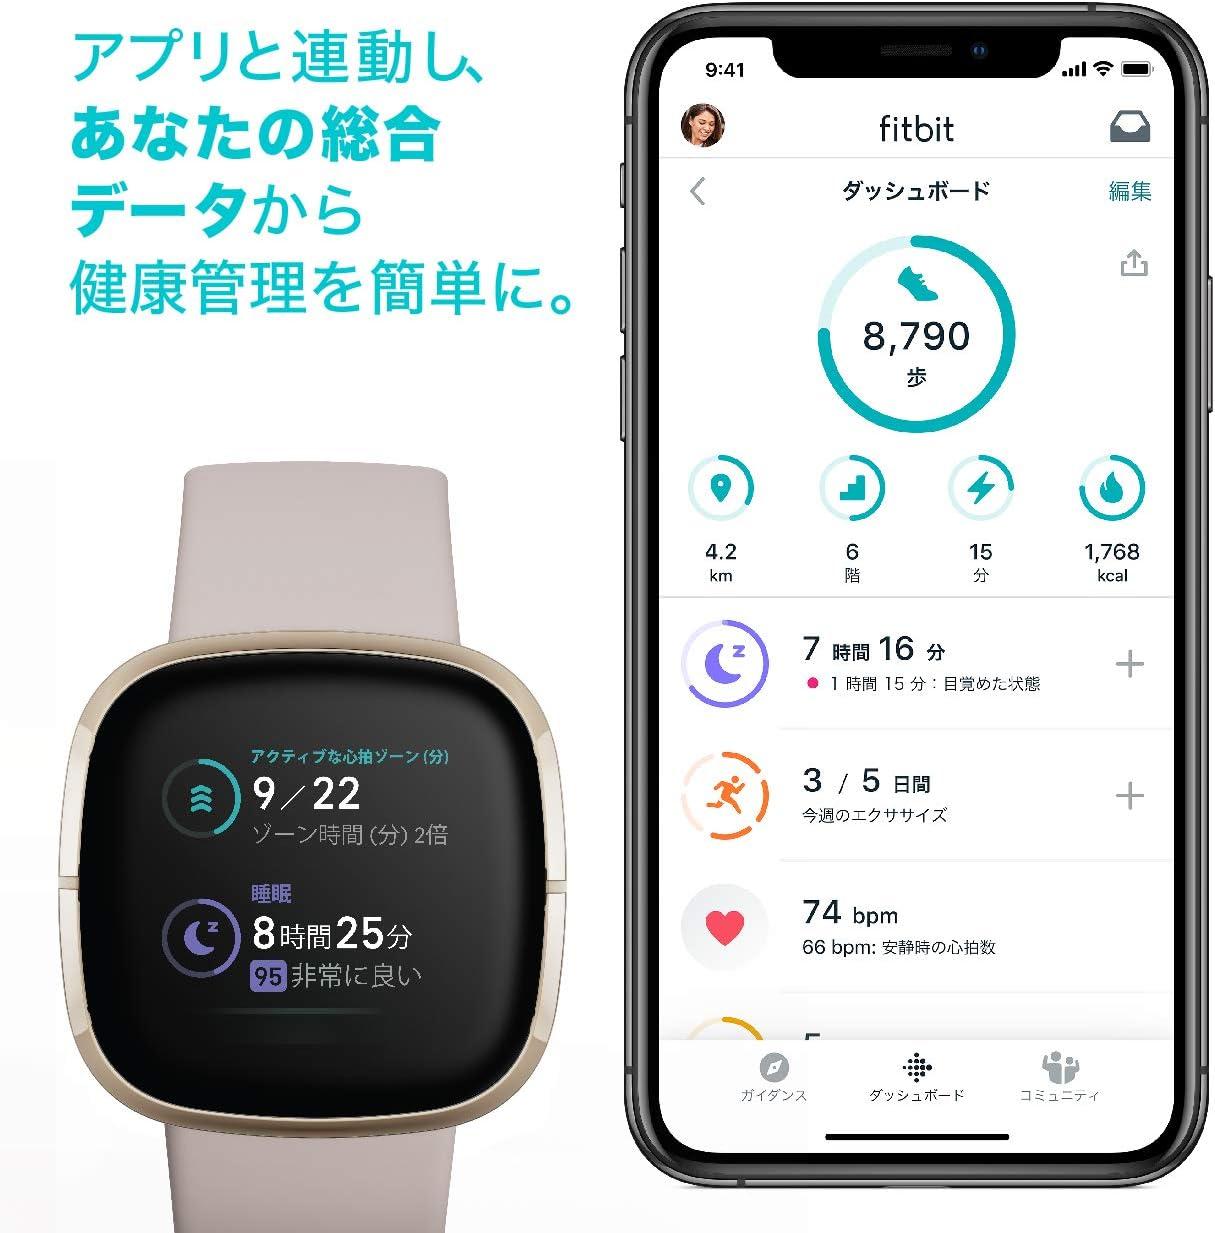 Fitbit Sense Alexa搭載/GPS搭載 スマートウォッチ Carbon/Graphite カーボン/グラファイト L/S サイズ [日本正規品]